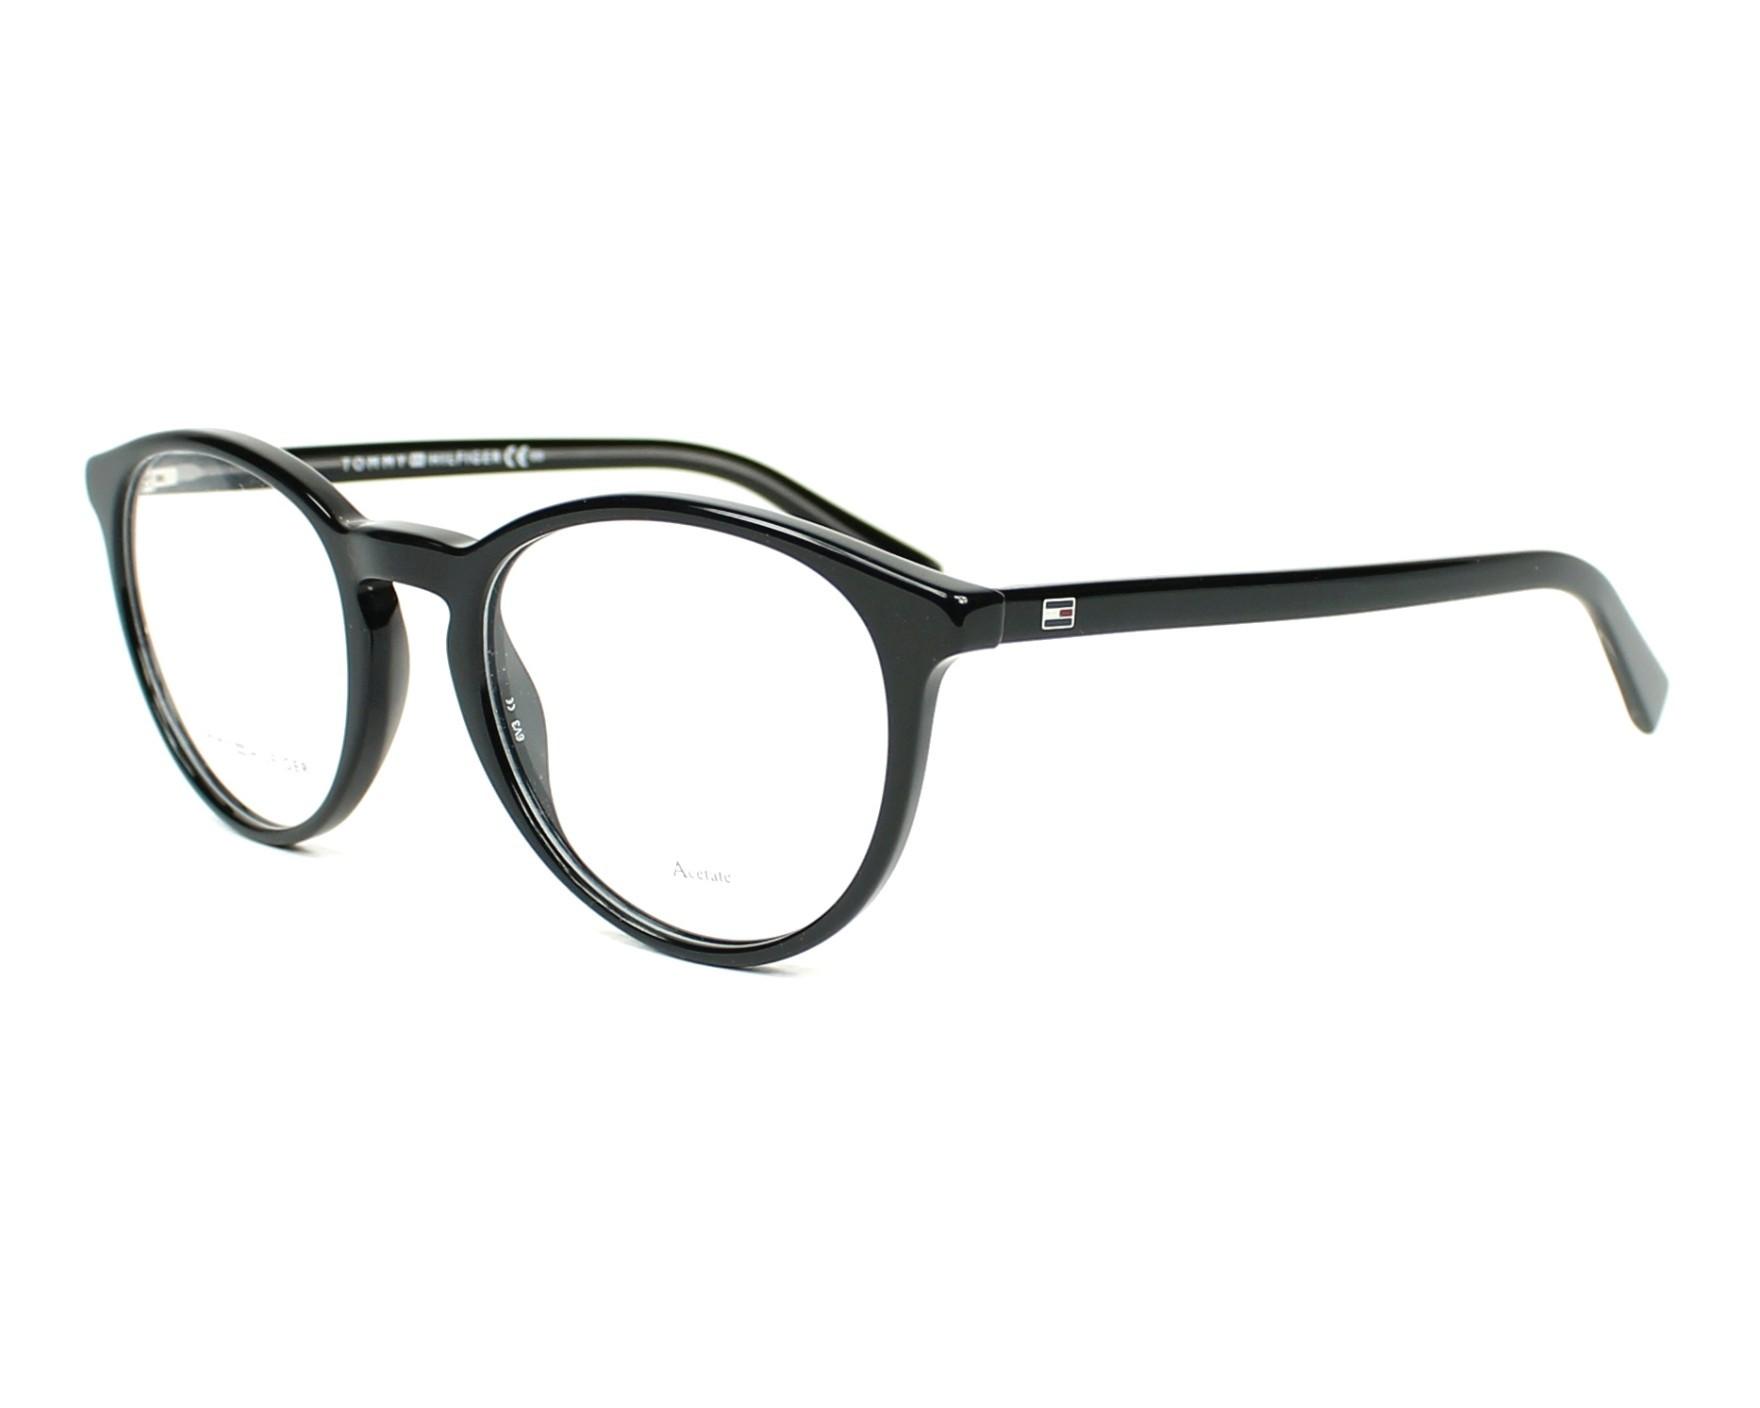 eyeglasses Tommy Hilfiger TH-1451 A5X 50-20 Black profile view